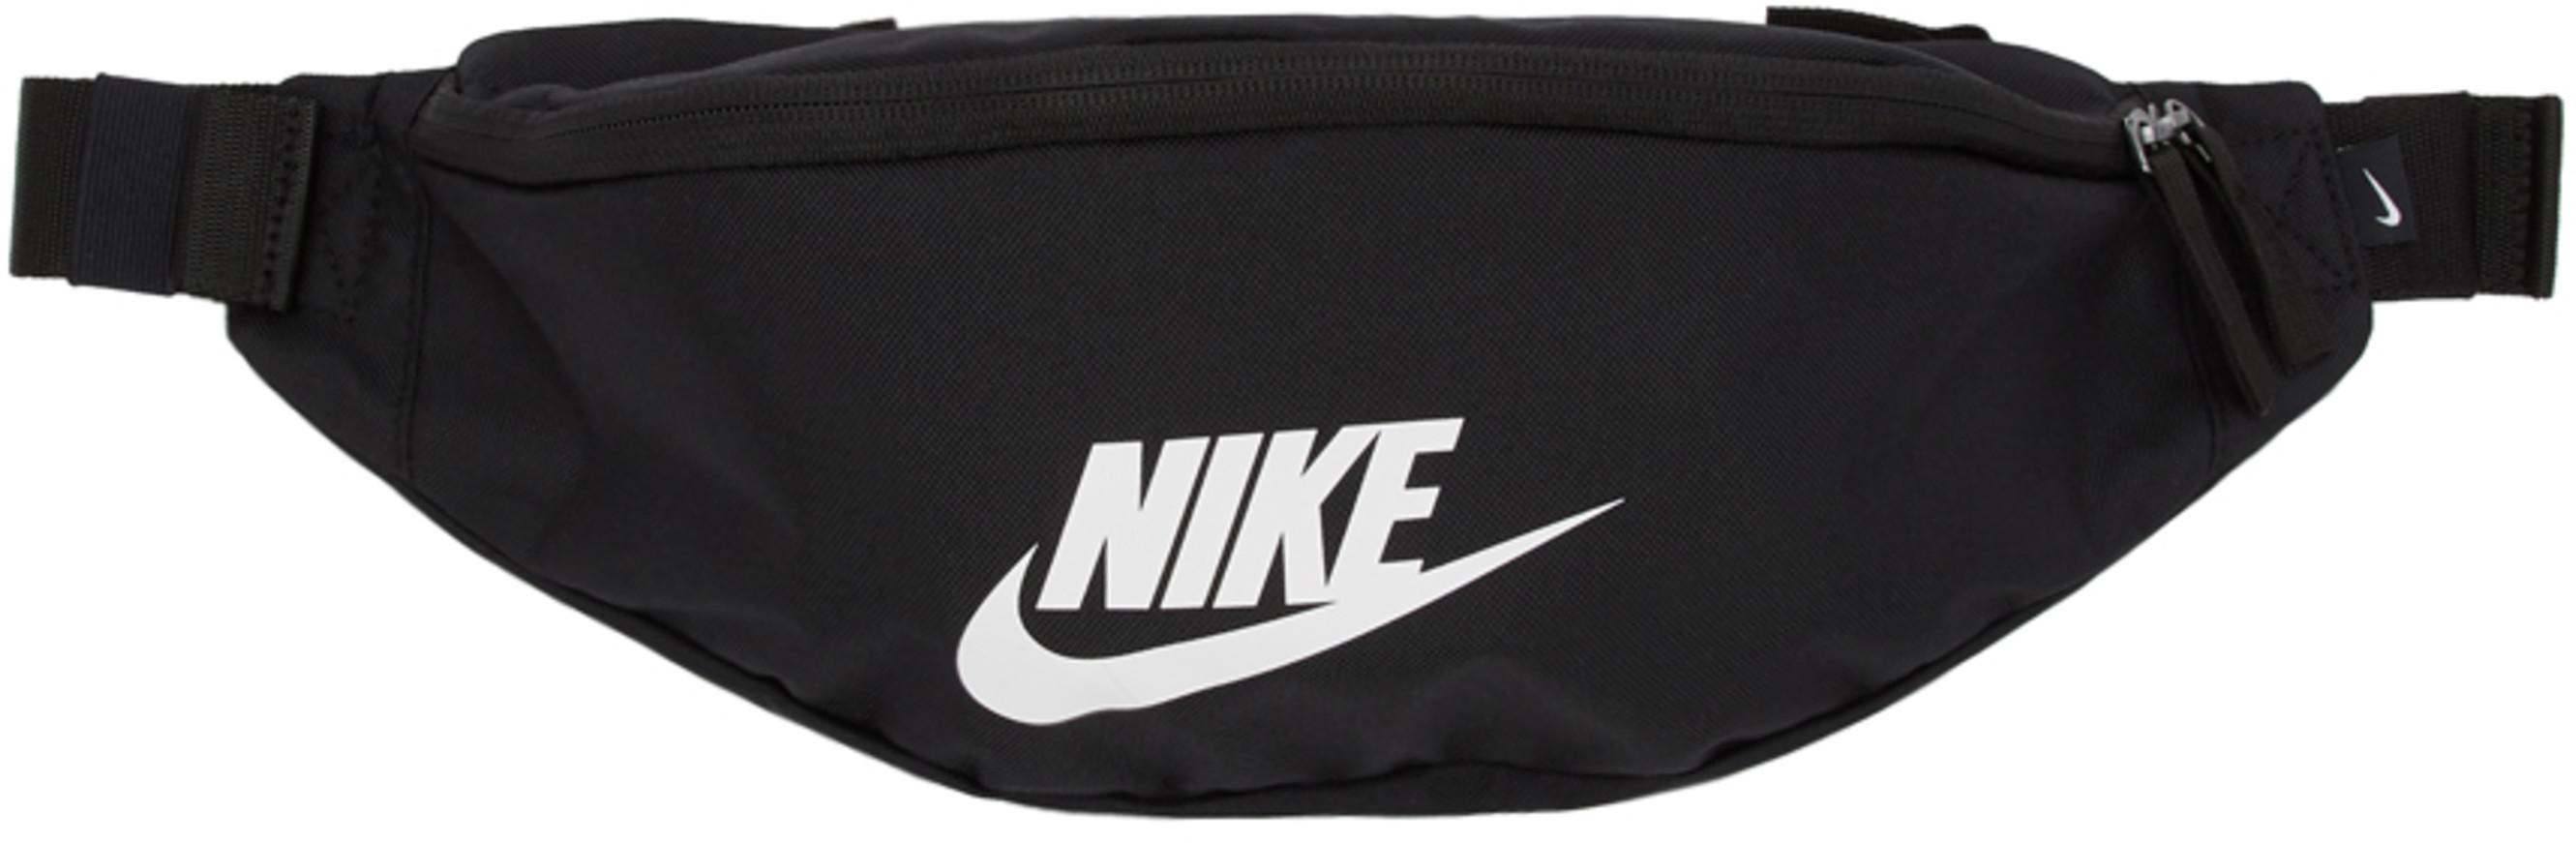 Nike for Women SS19 Collection   SSENSE 365bdda1e2